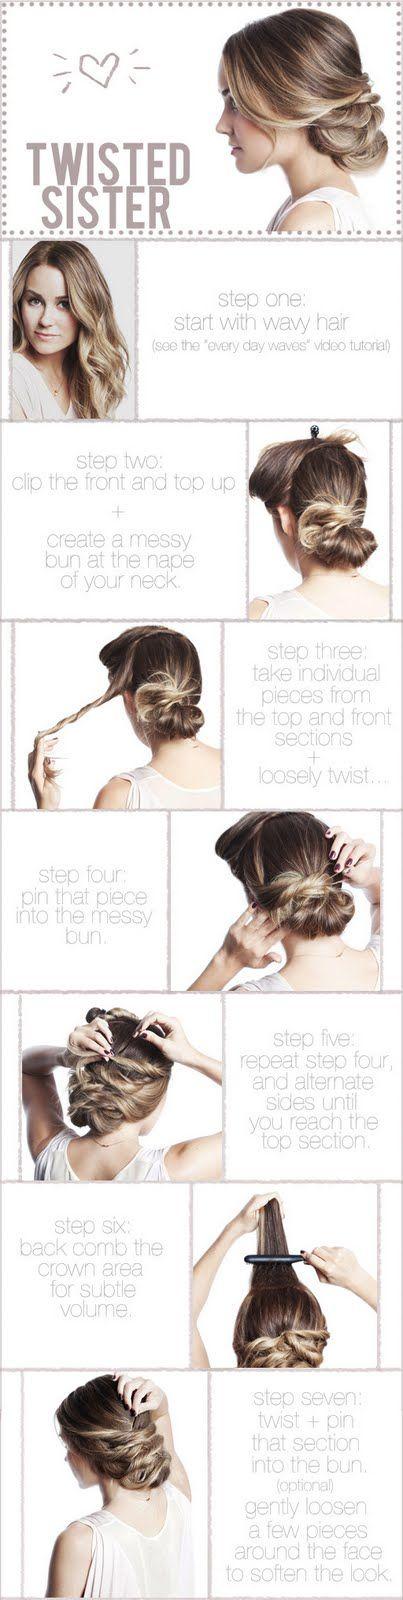 up-do: Hair Ideas, Hair Tutorials, Long Hair, Hairstyle, Messy Buns, Hair Style, Twists Sisters, Lauren Conrad, Updo